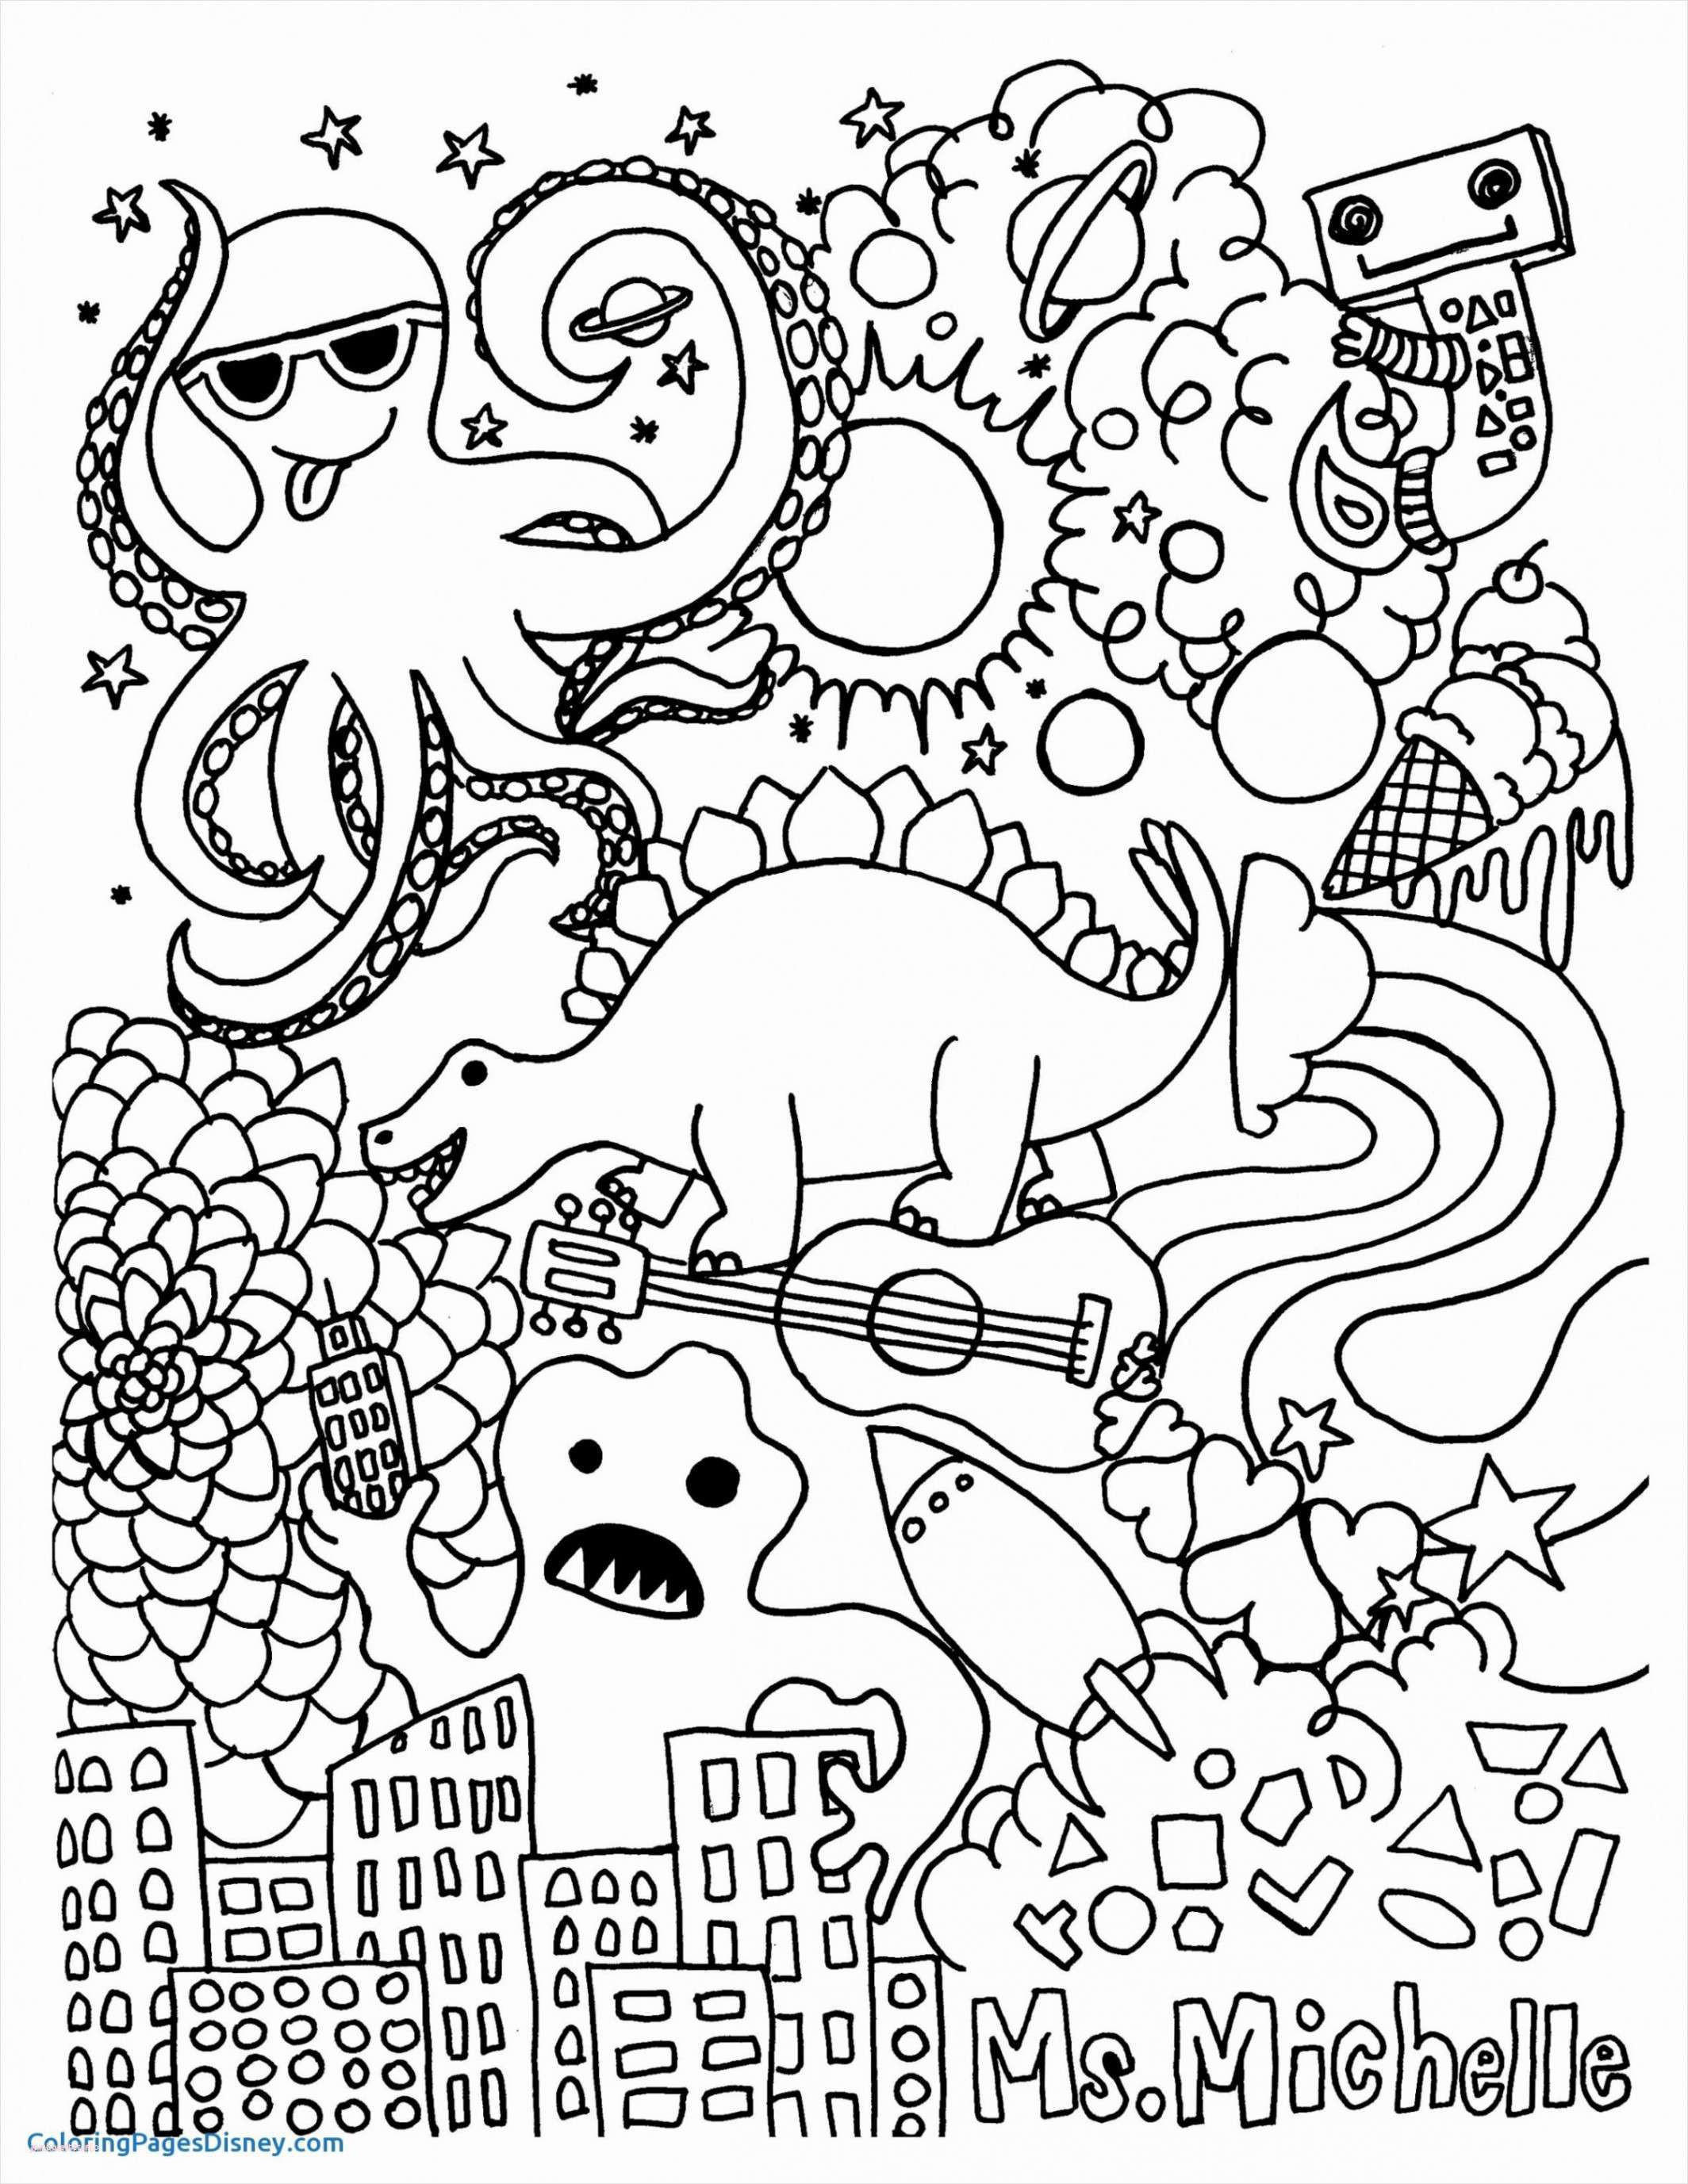 Ausmalbilder Monster High Clawdeen Wolf Neu Monster High Ausmalbilder Clawdeen Frisch Clawdeen Wolf Style Frisch Bild